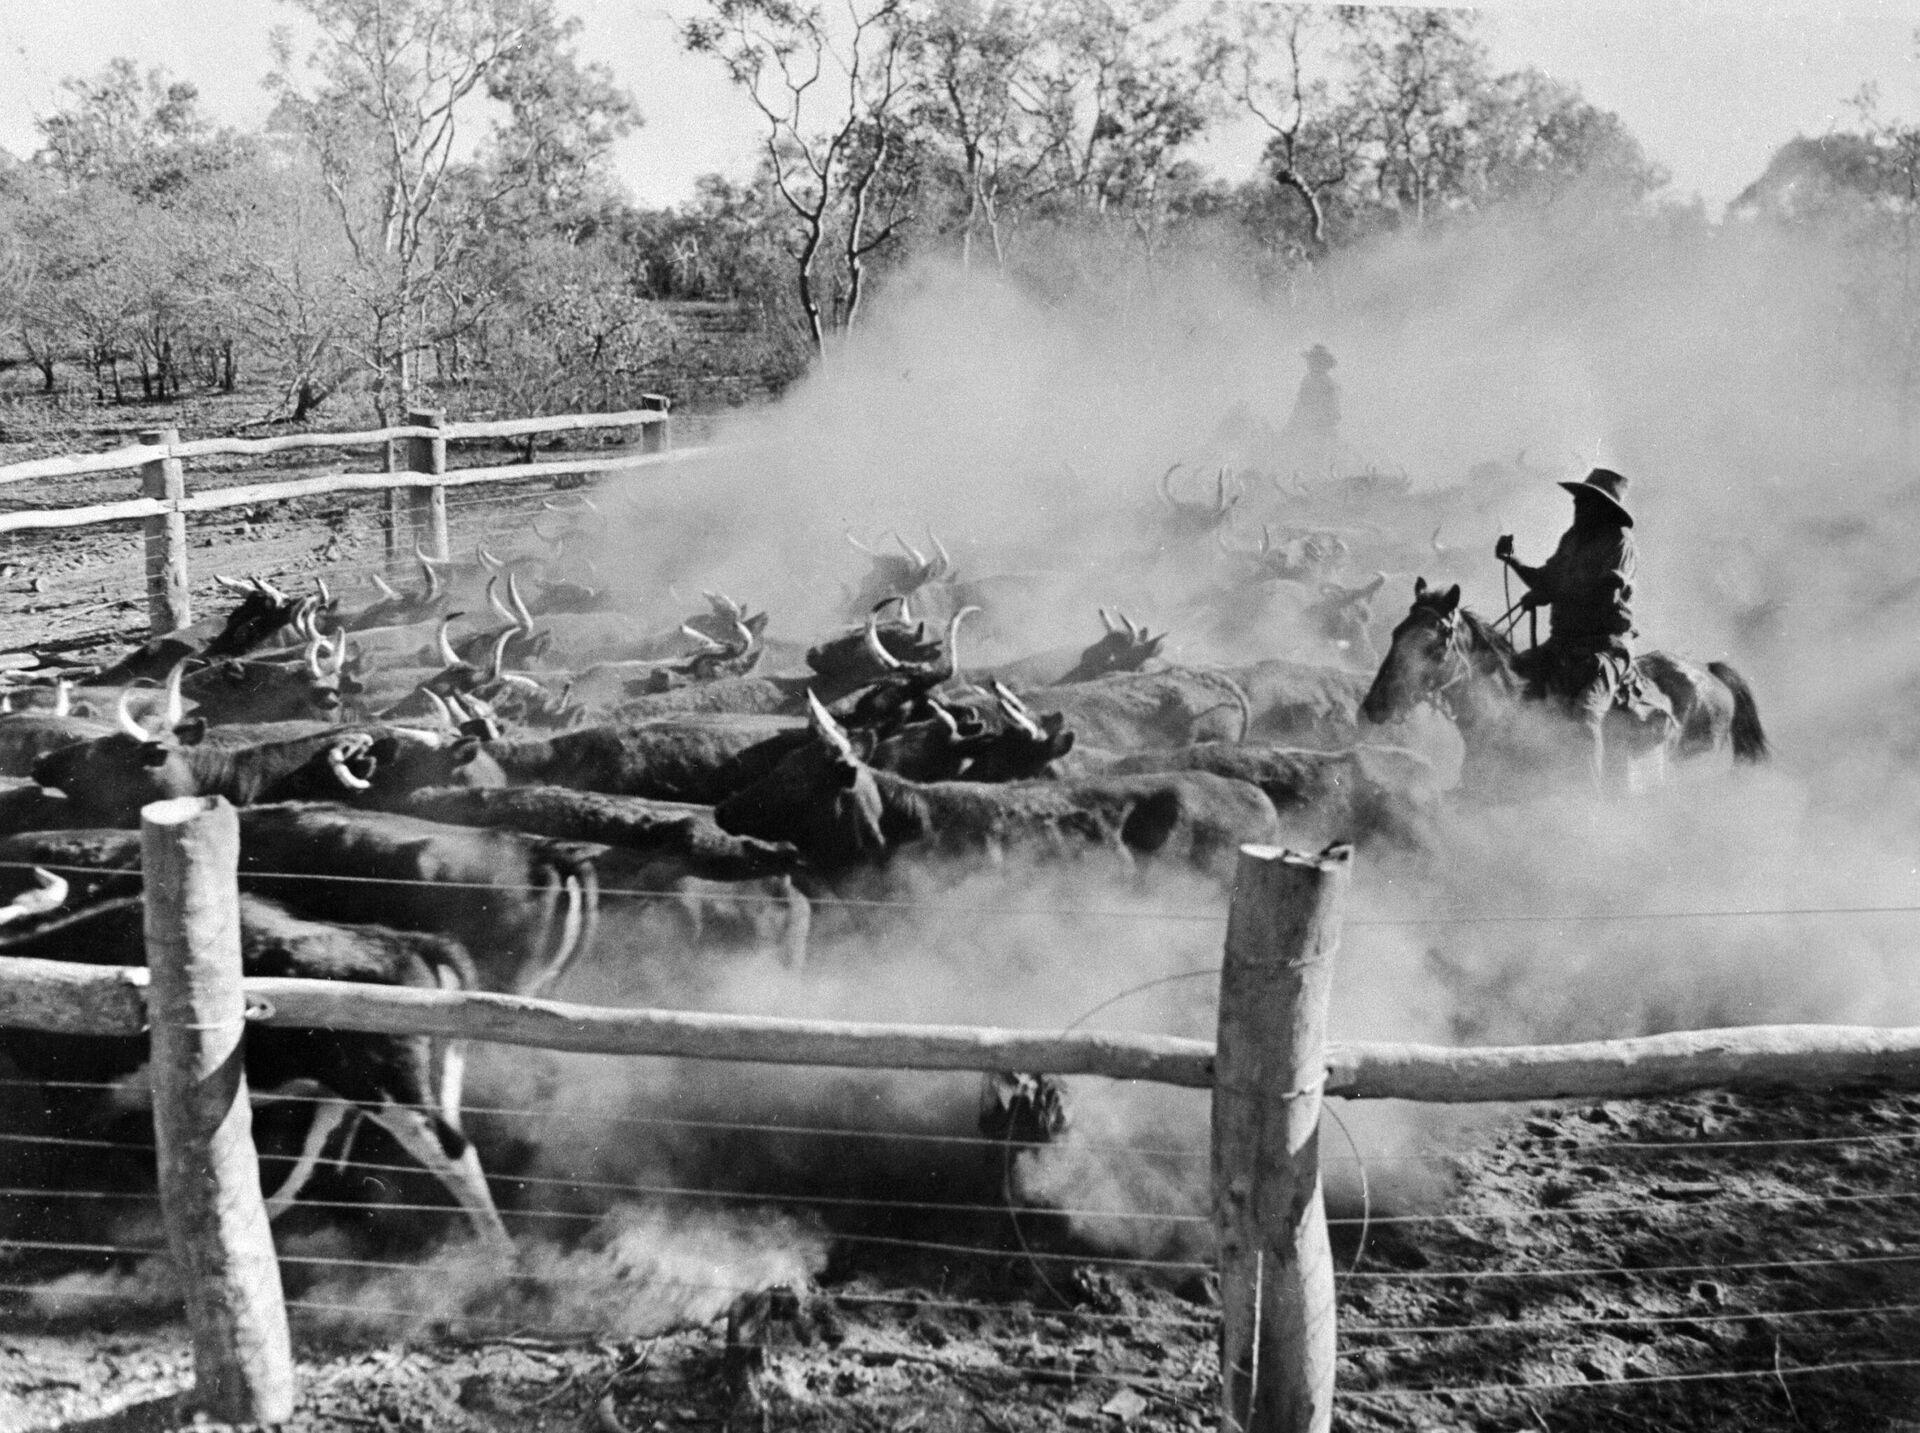 Пастухи загоняют в загон стадо крупного рогатого скота - РИА Новости, 1920, 25.01.2021